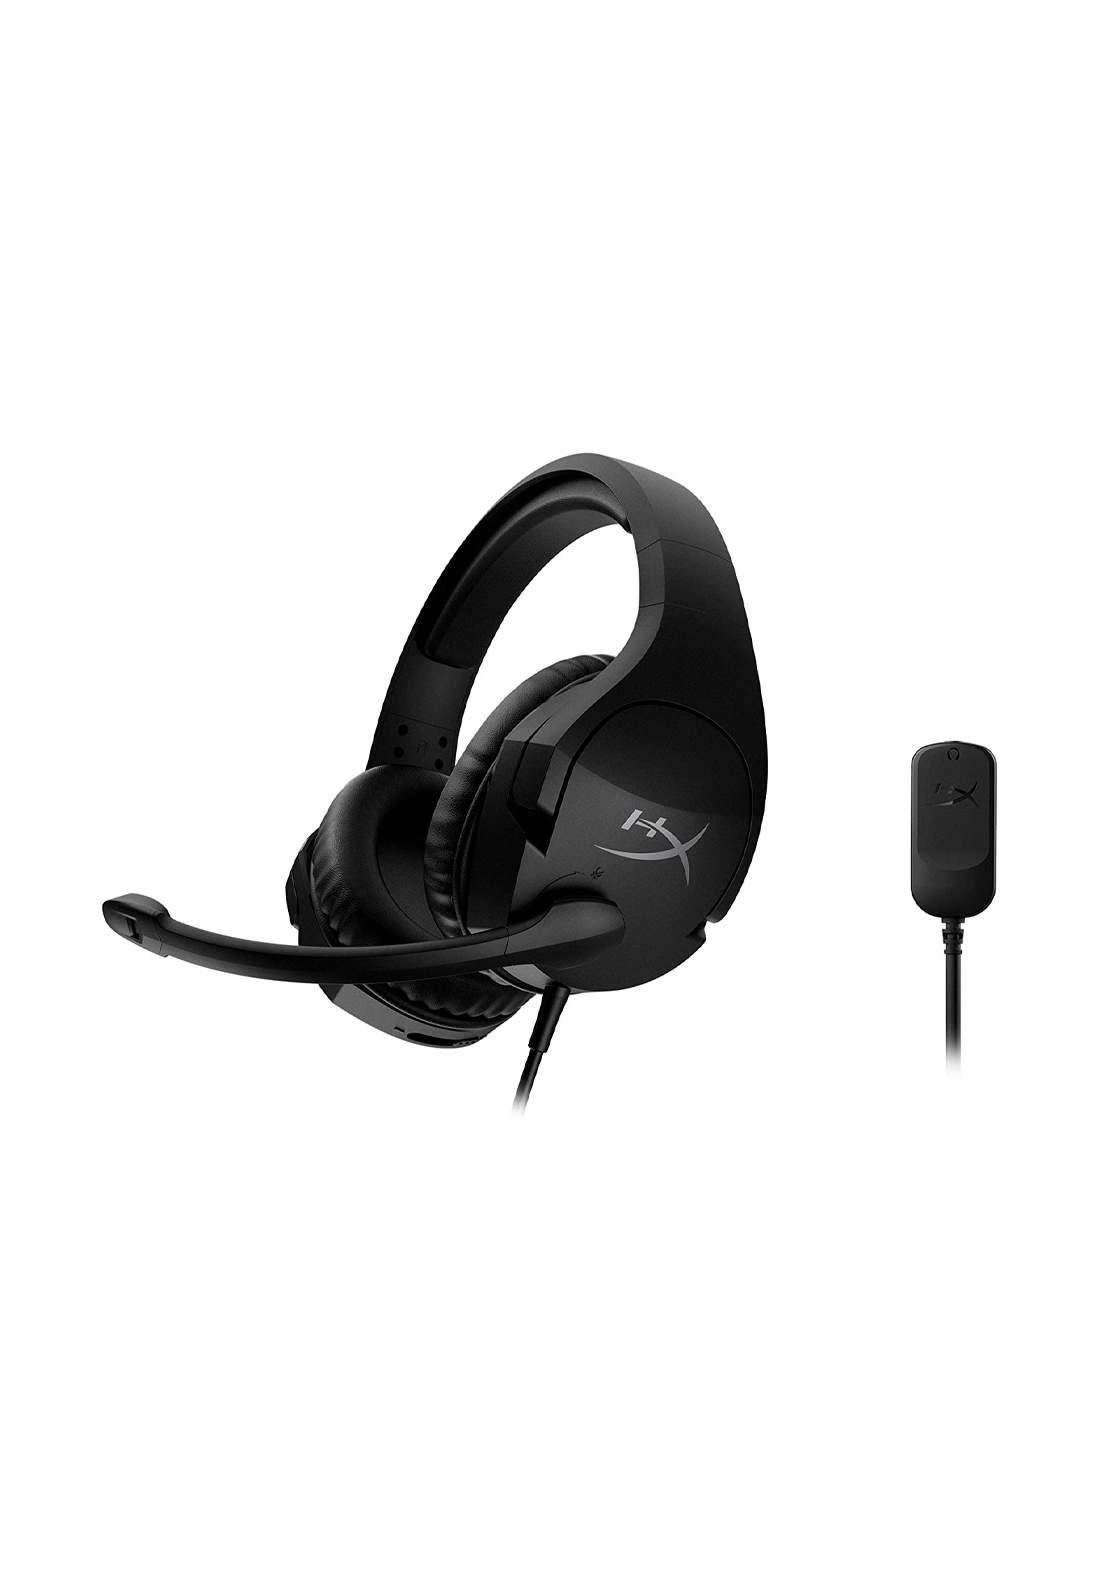 HyperX Cloud Stinger S Gaming Headset - Black سماعة